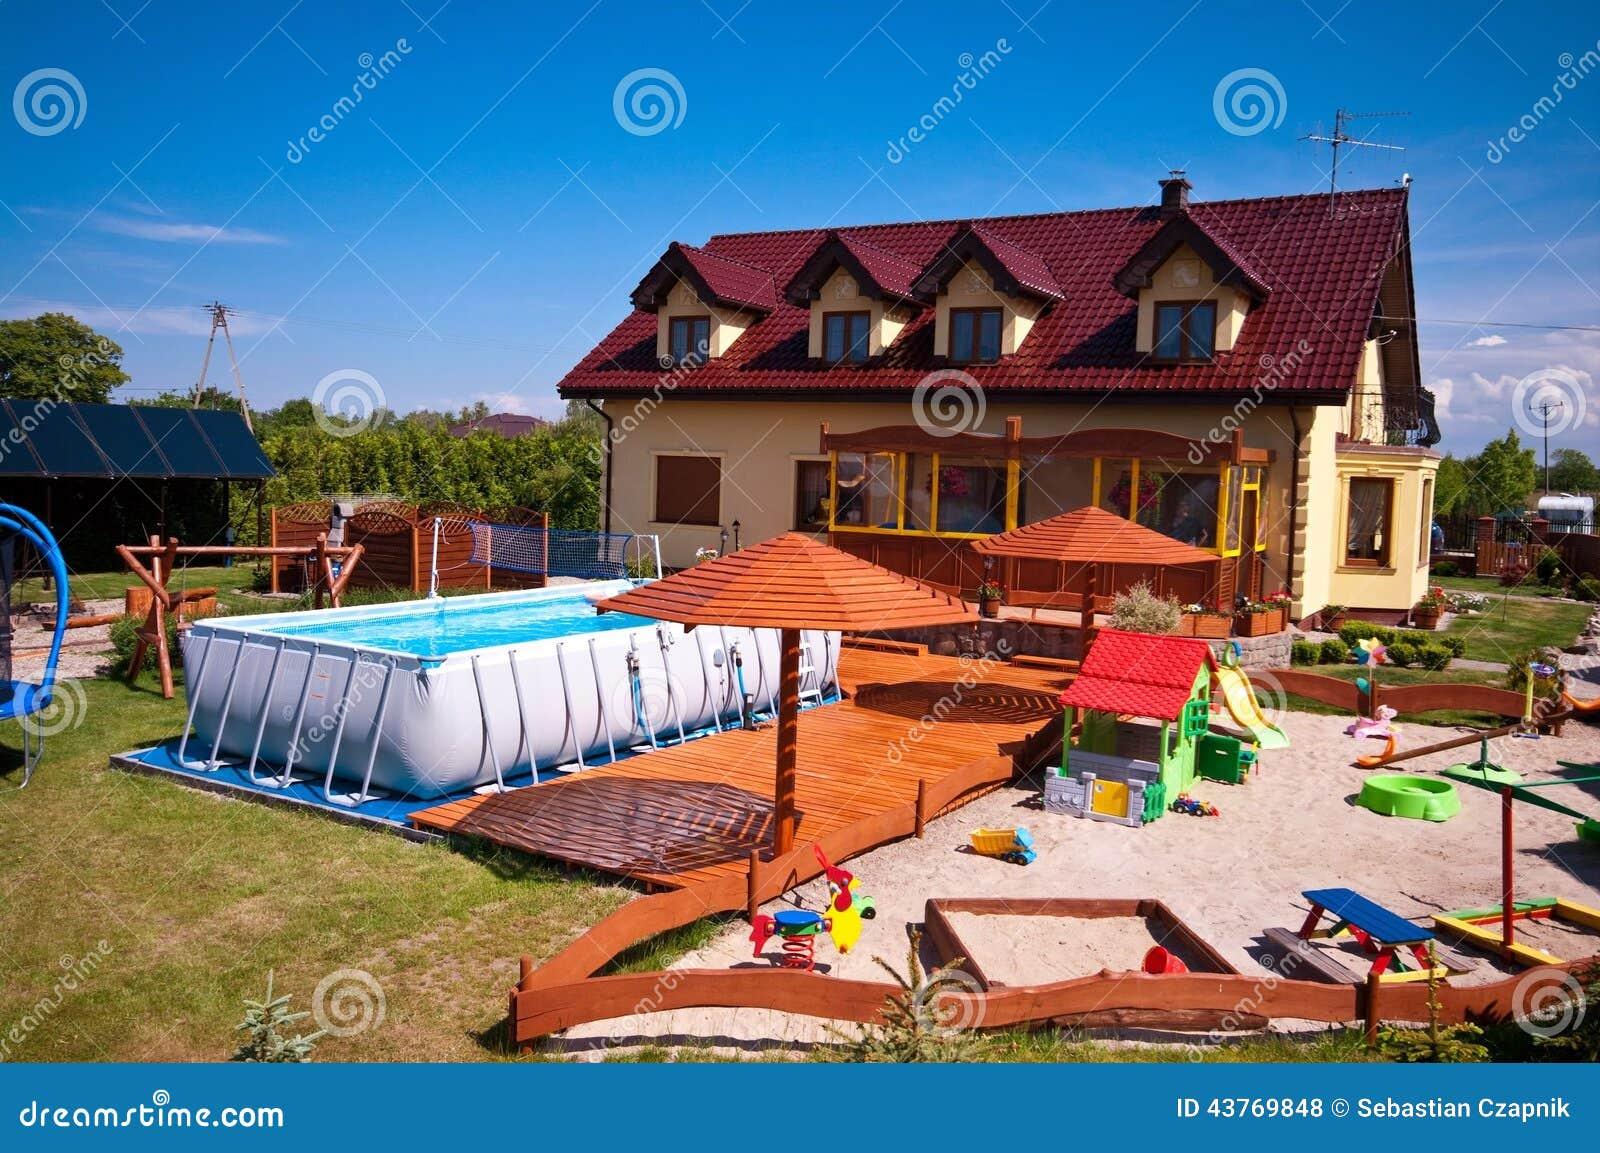 Backyard With Swimming Pool And Sandbox